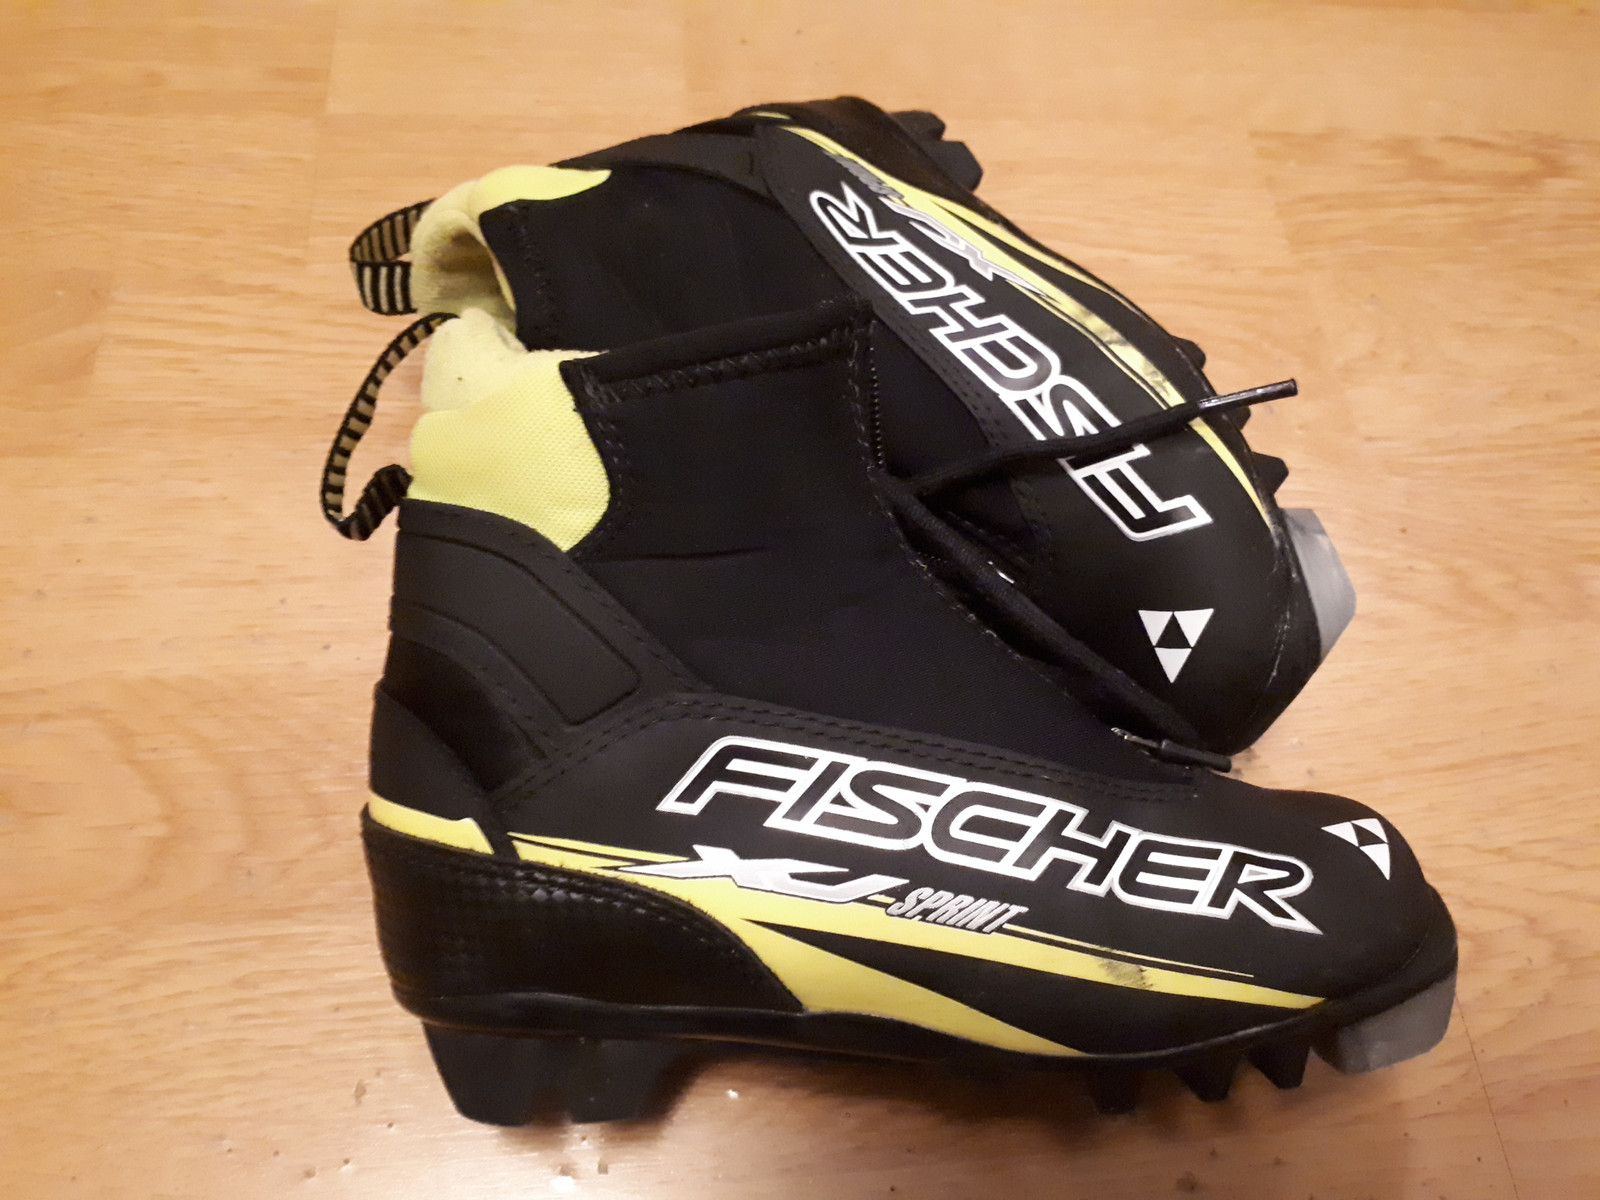 Fischer sko XJ Sprint str 32 selges kr 200 | FINN.no